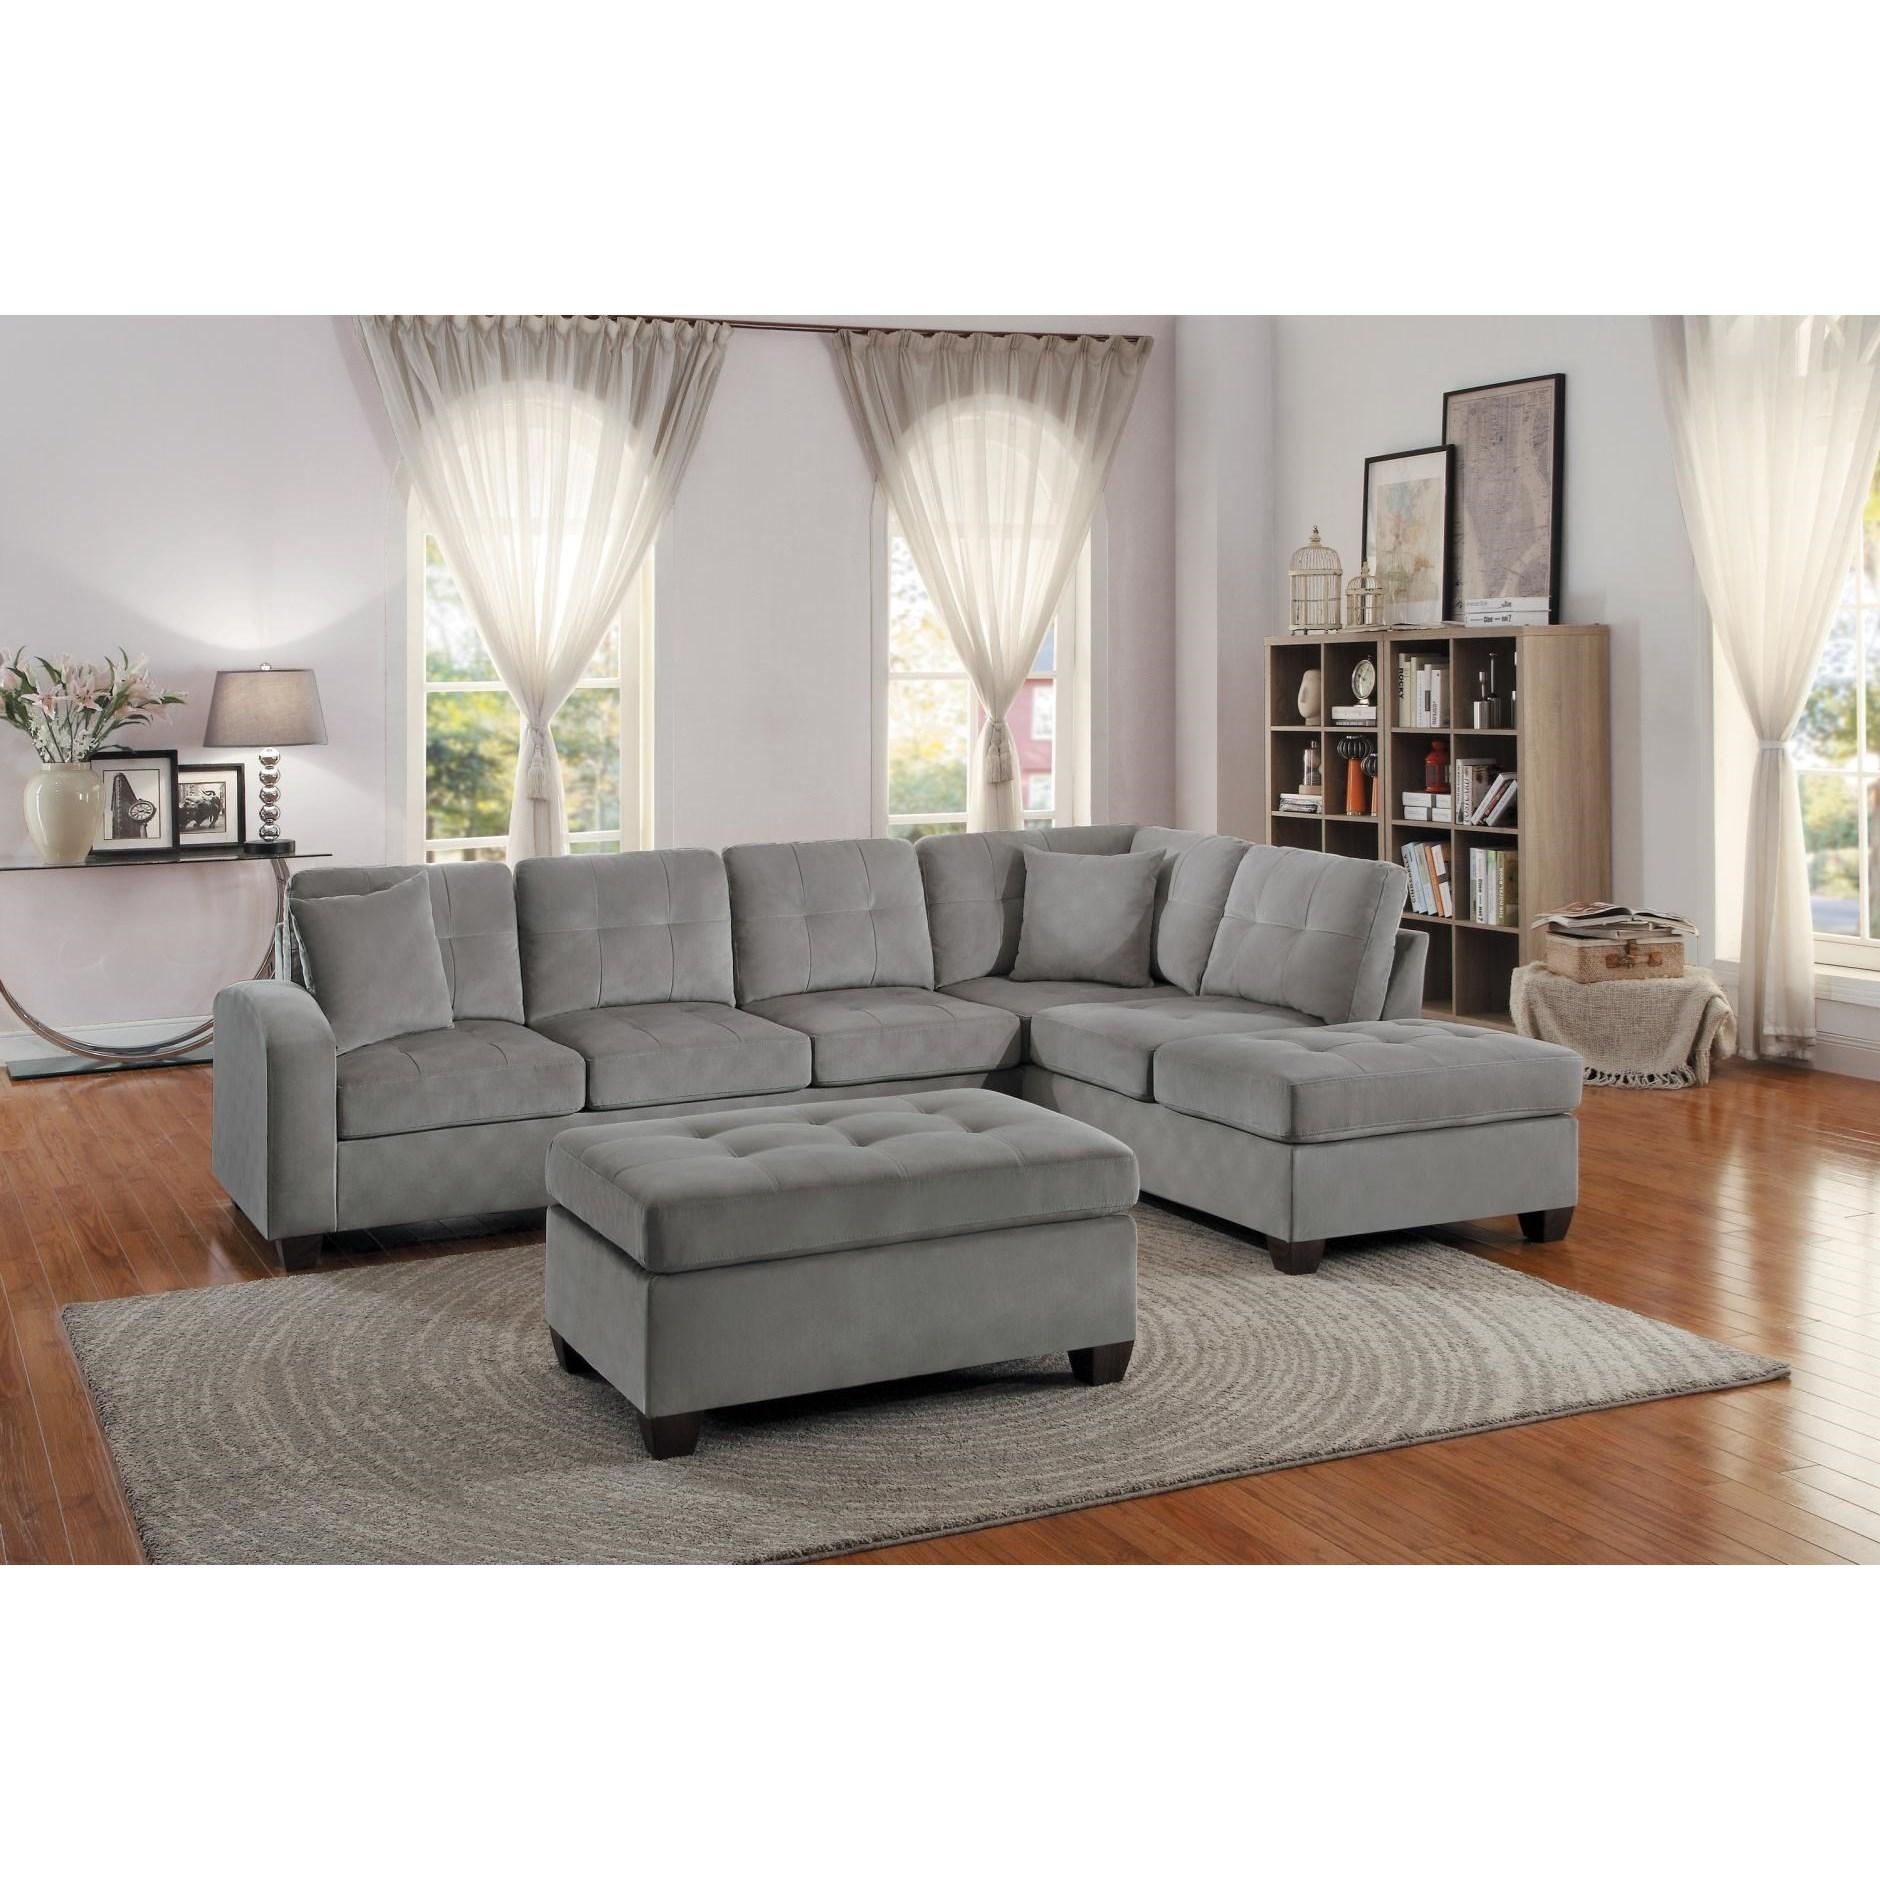 homelegance emilio stationary living room group  value